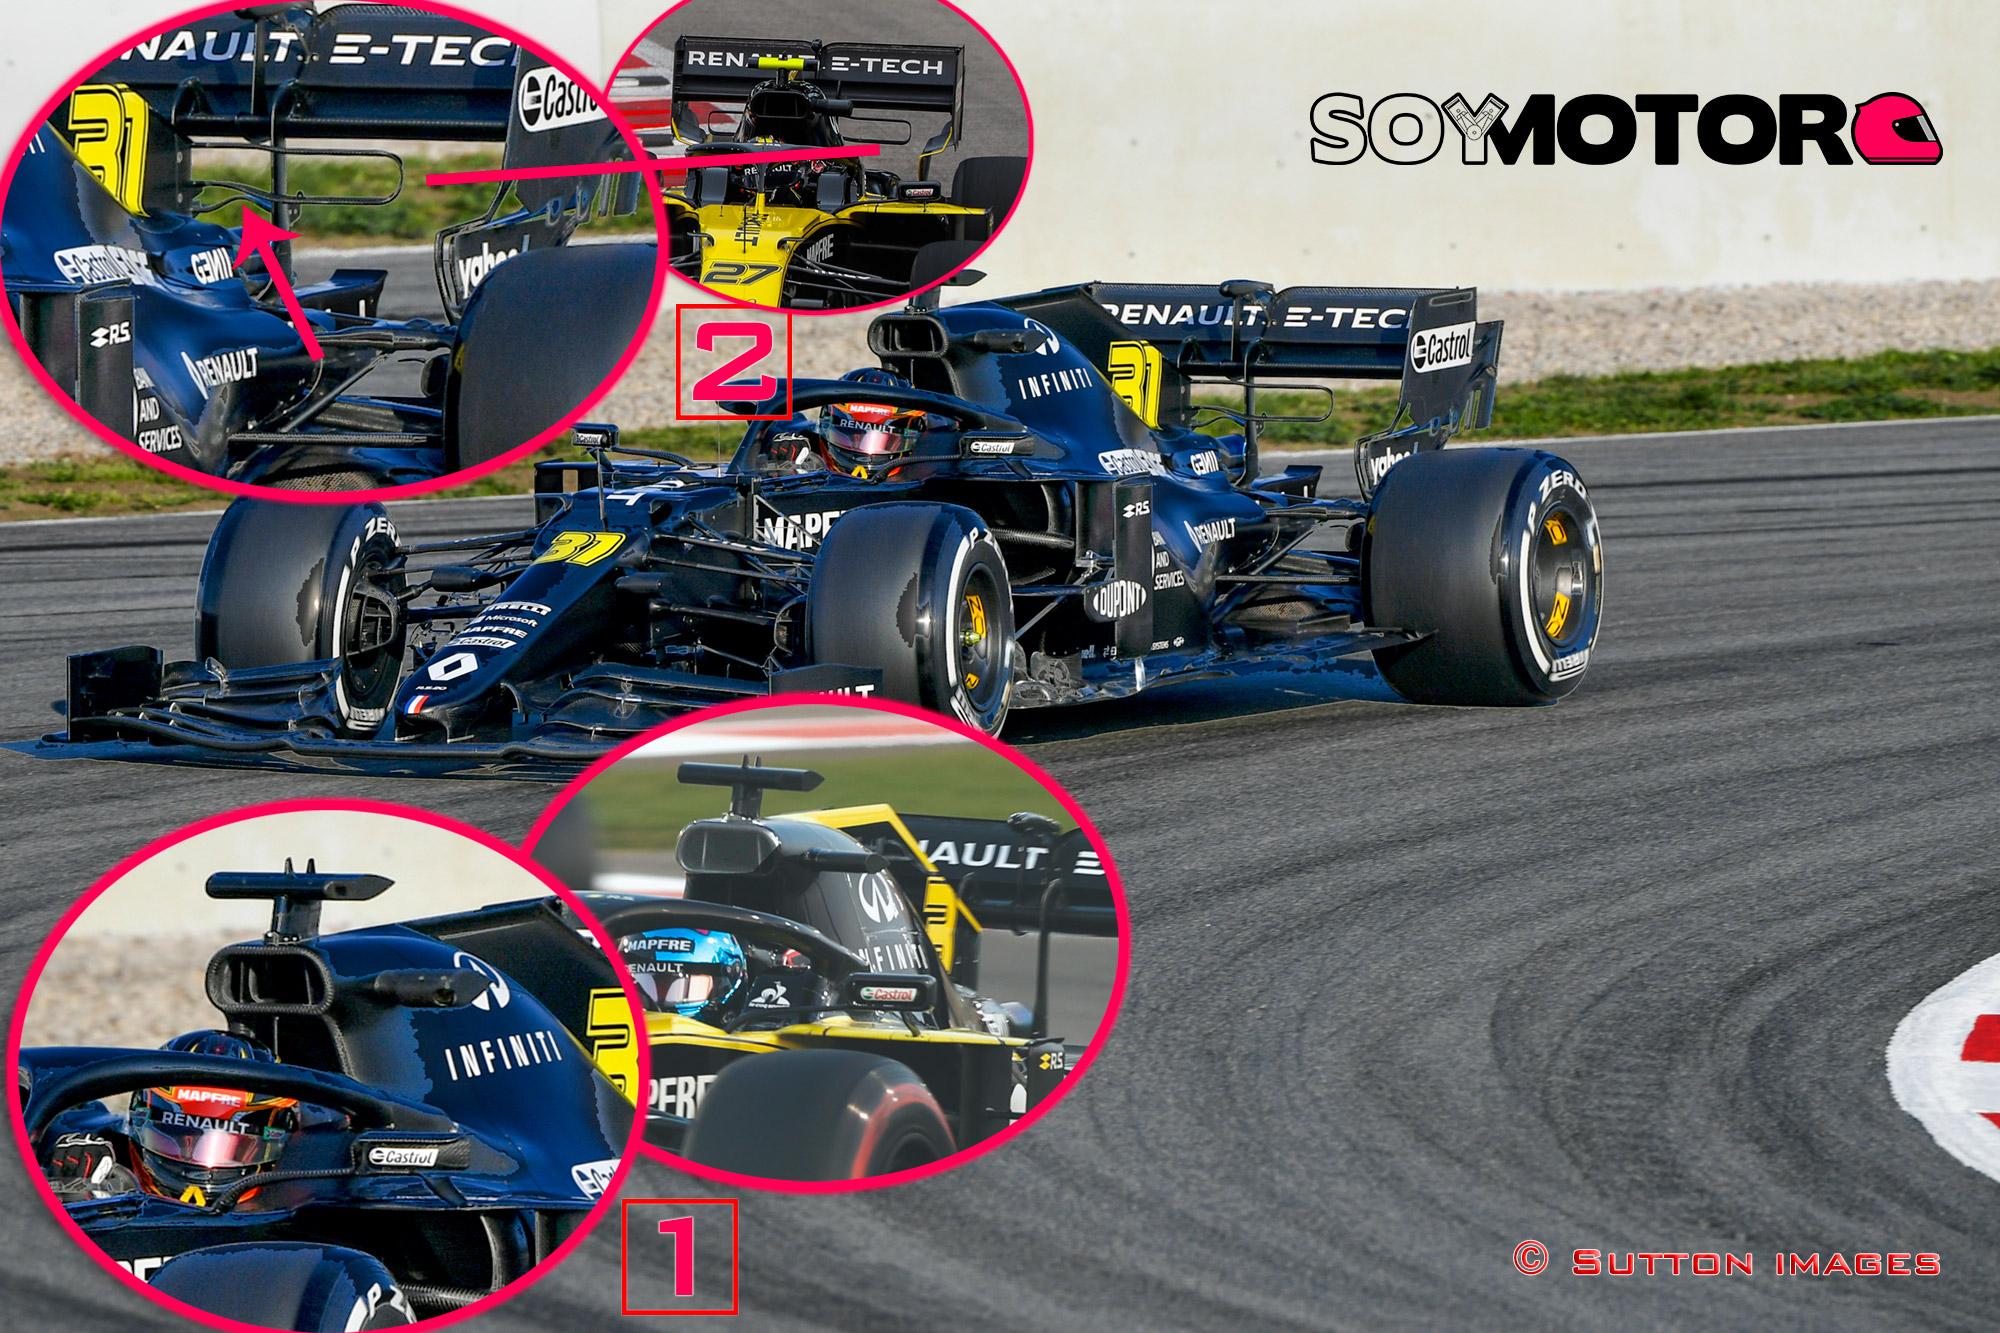 renault-fronto-lateral-soymotor.jpg